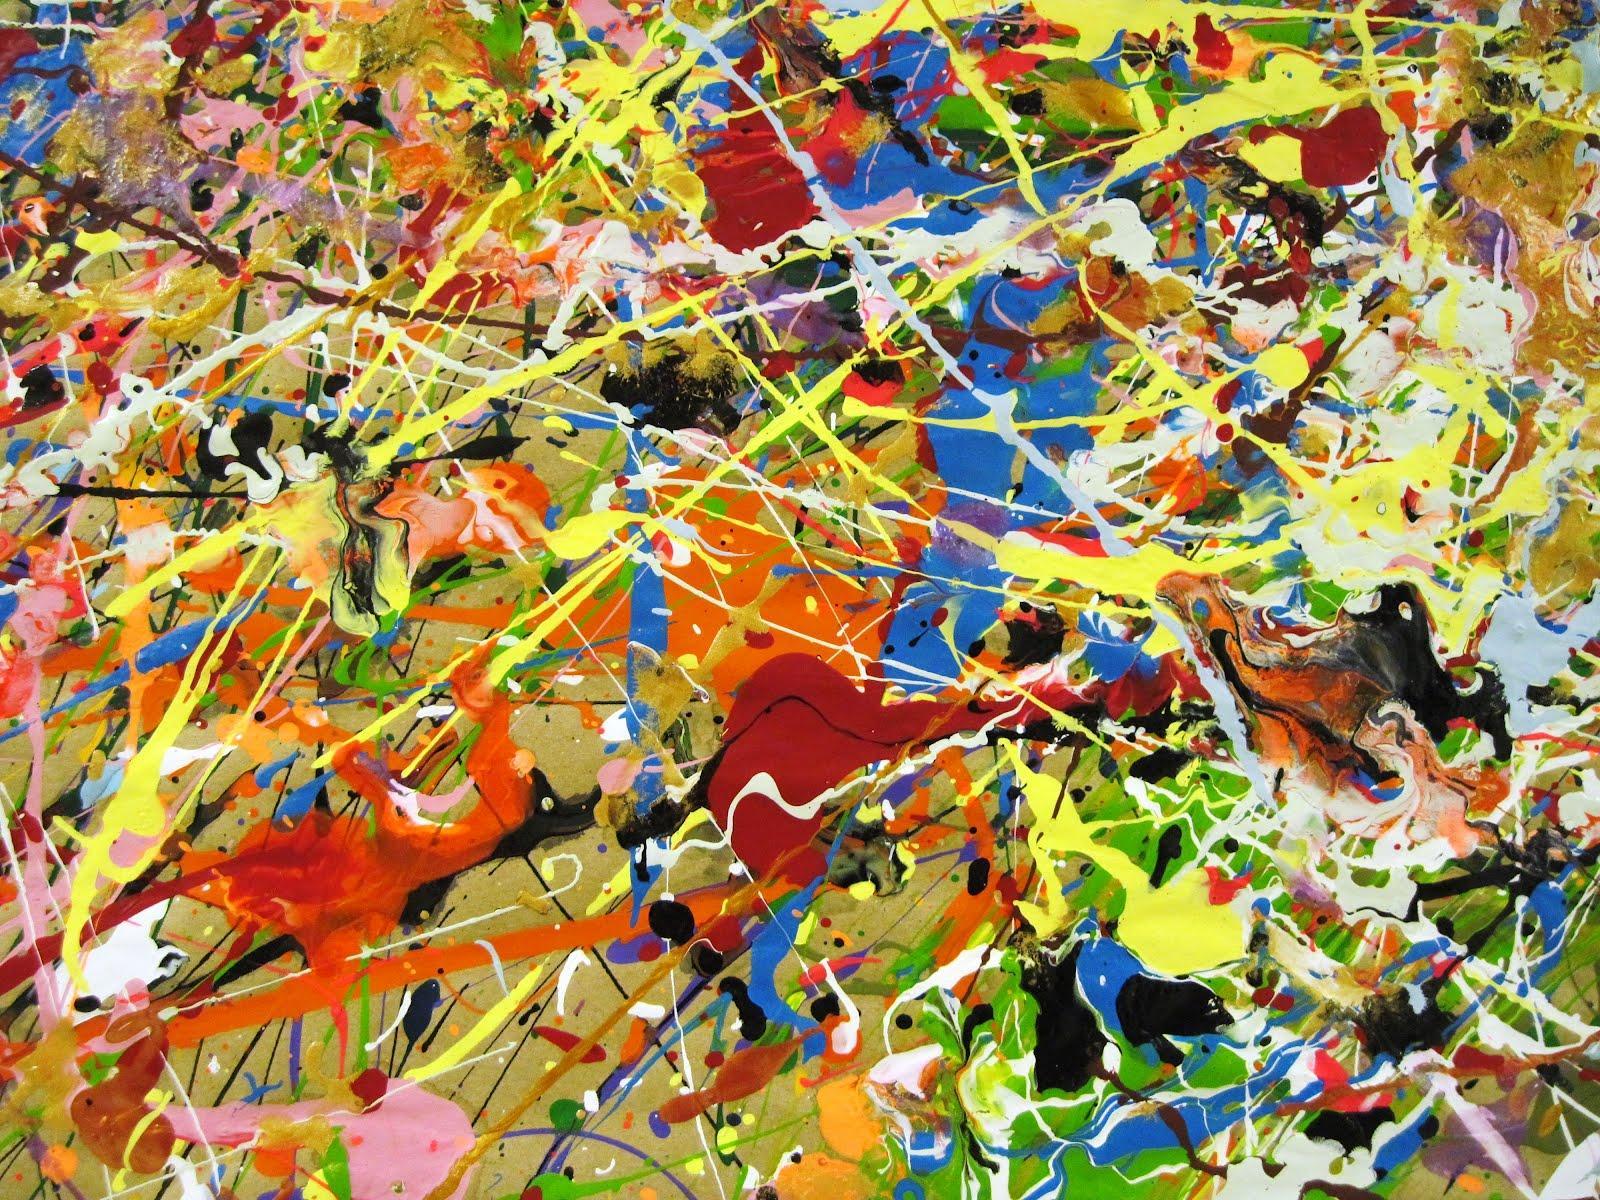 jackson pollock wallpaper - photo #1